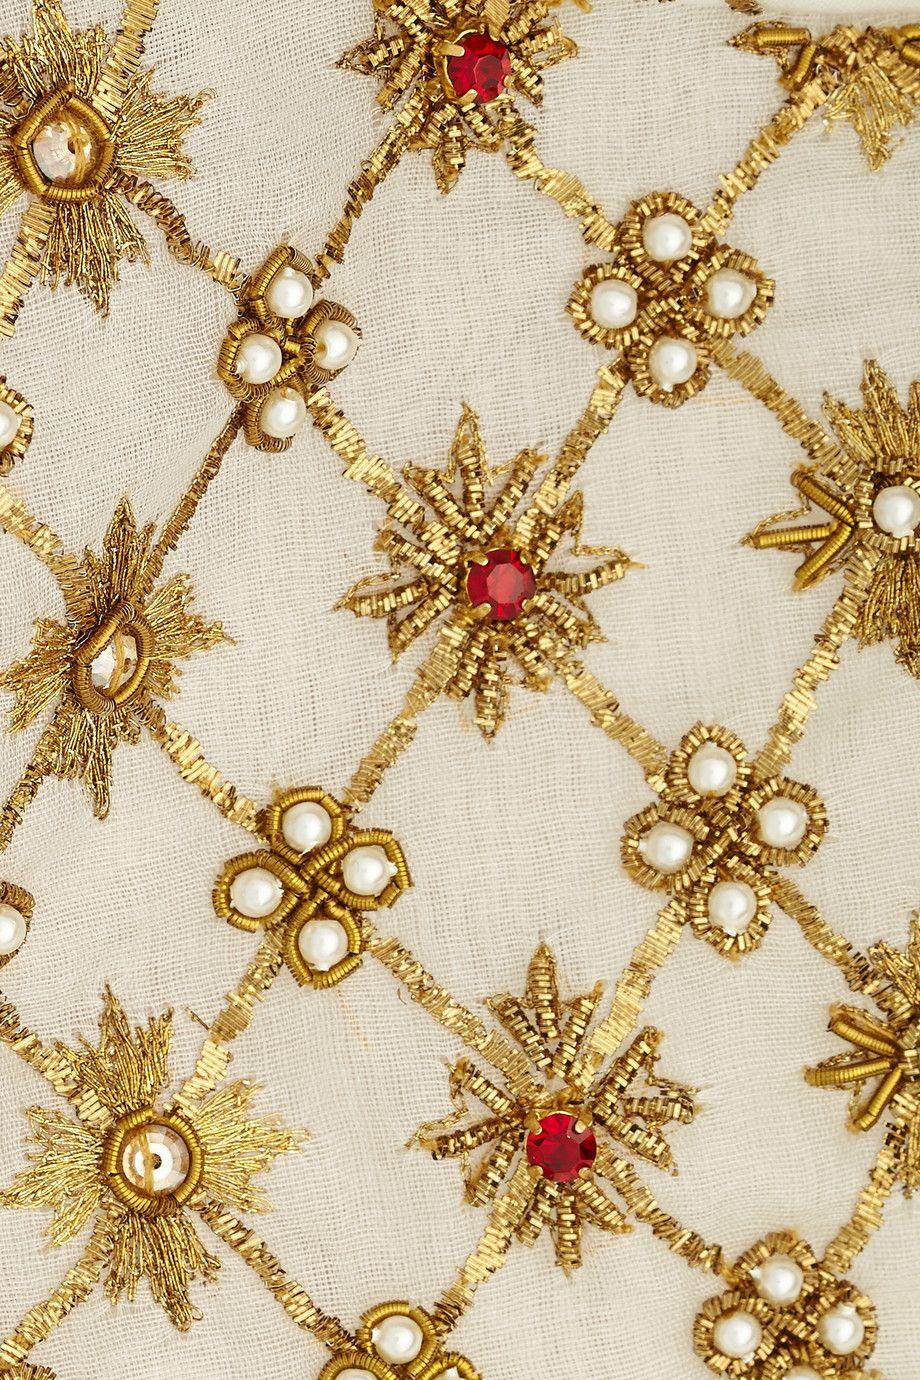 Alexander mcqueen embellished pleated silkorganza blouse